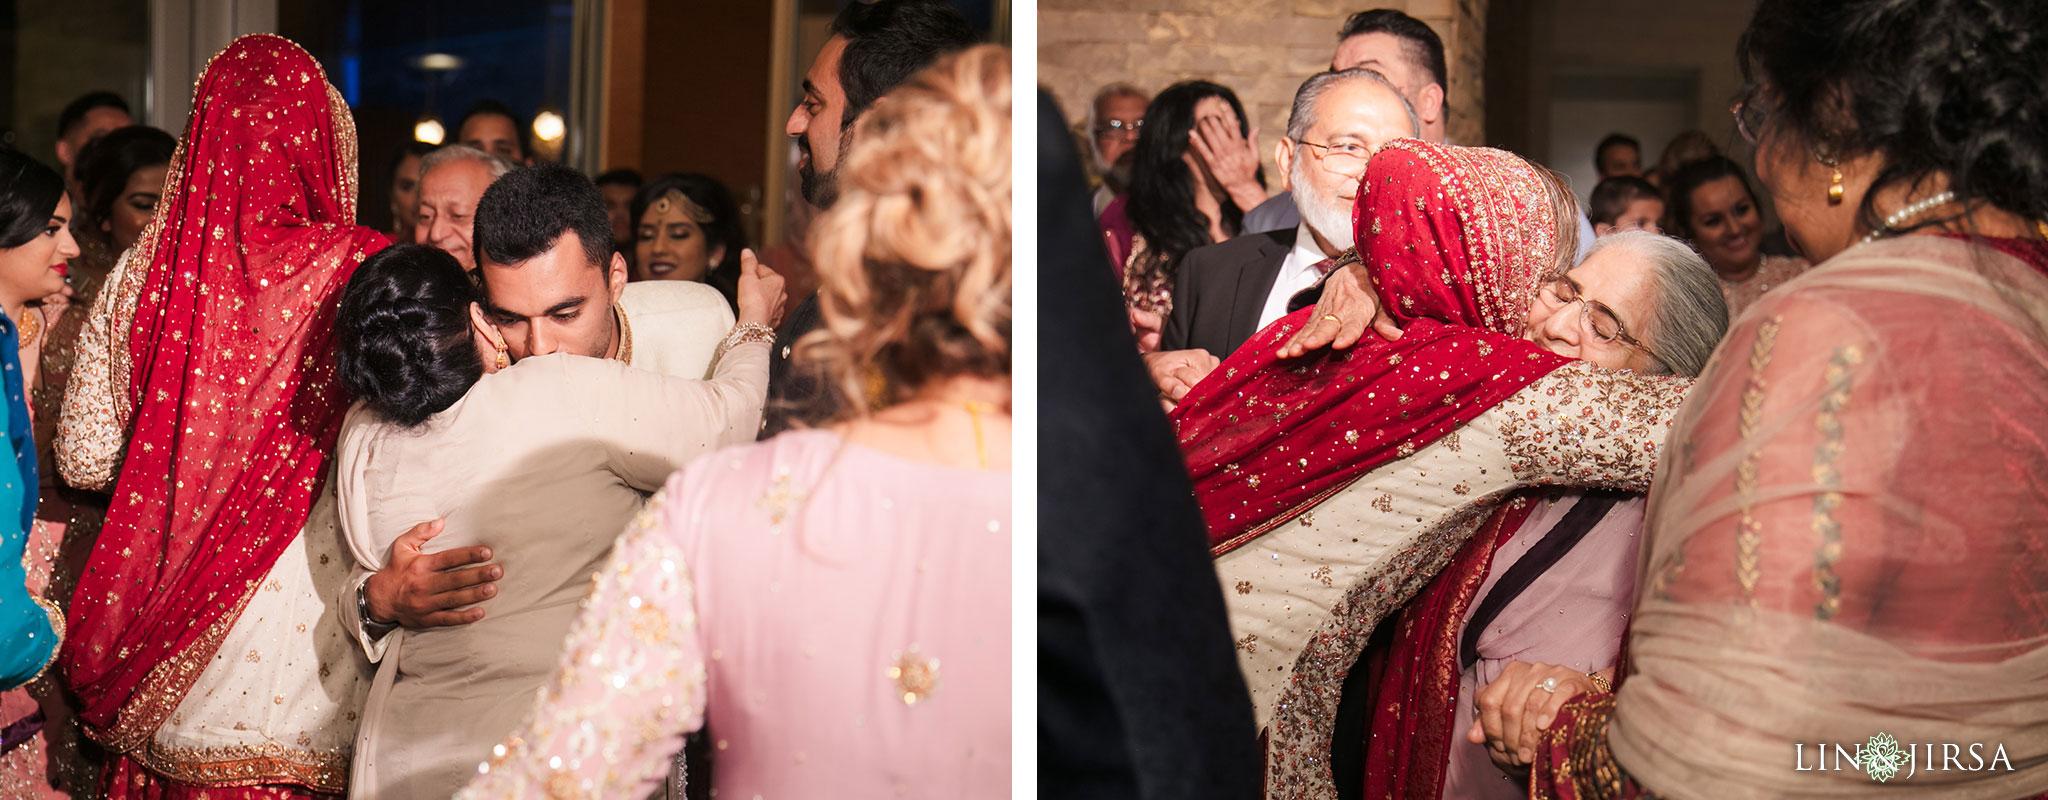 038 pasea hotel huntington beach pakistani rukhsati wedding photography